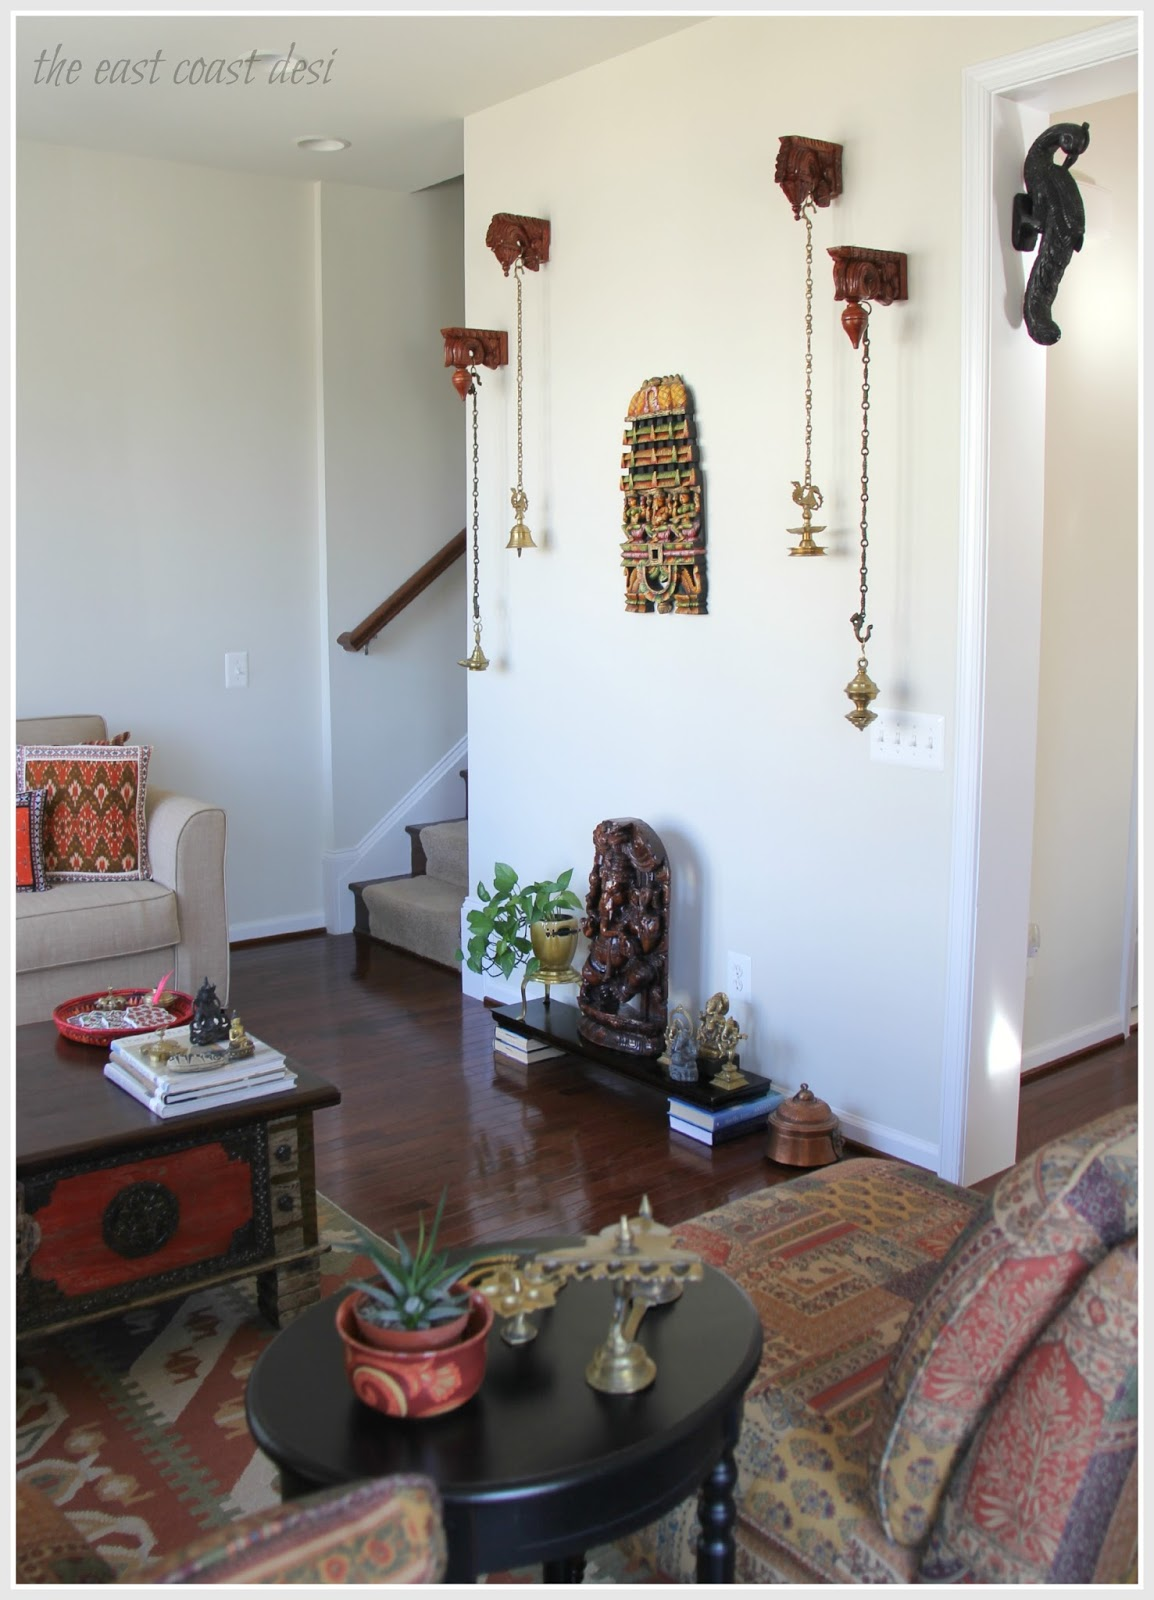 The east coast desi happy second birthday tecd for South indian home decor ideas